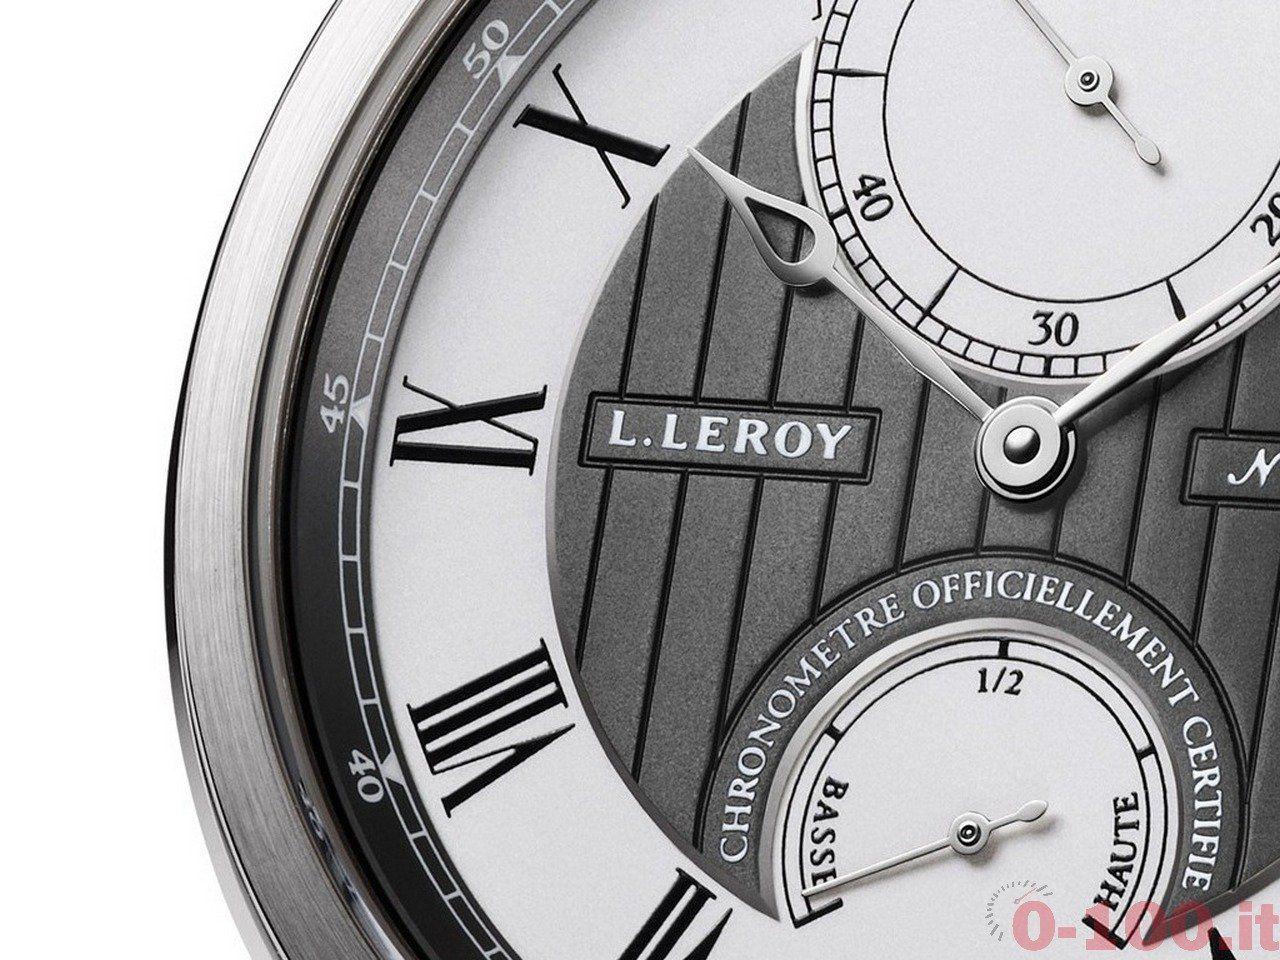 l-leroy-marine-cronometro-da-ponte-a-carica-automatica-0-100_9